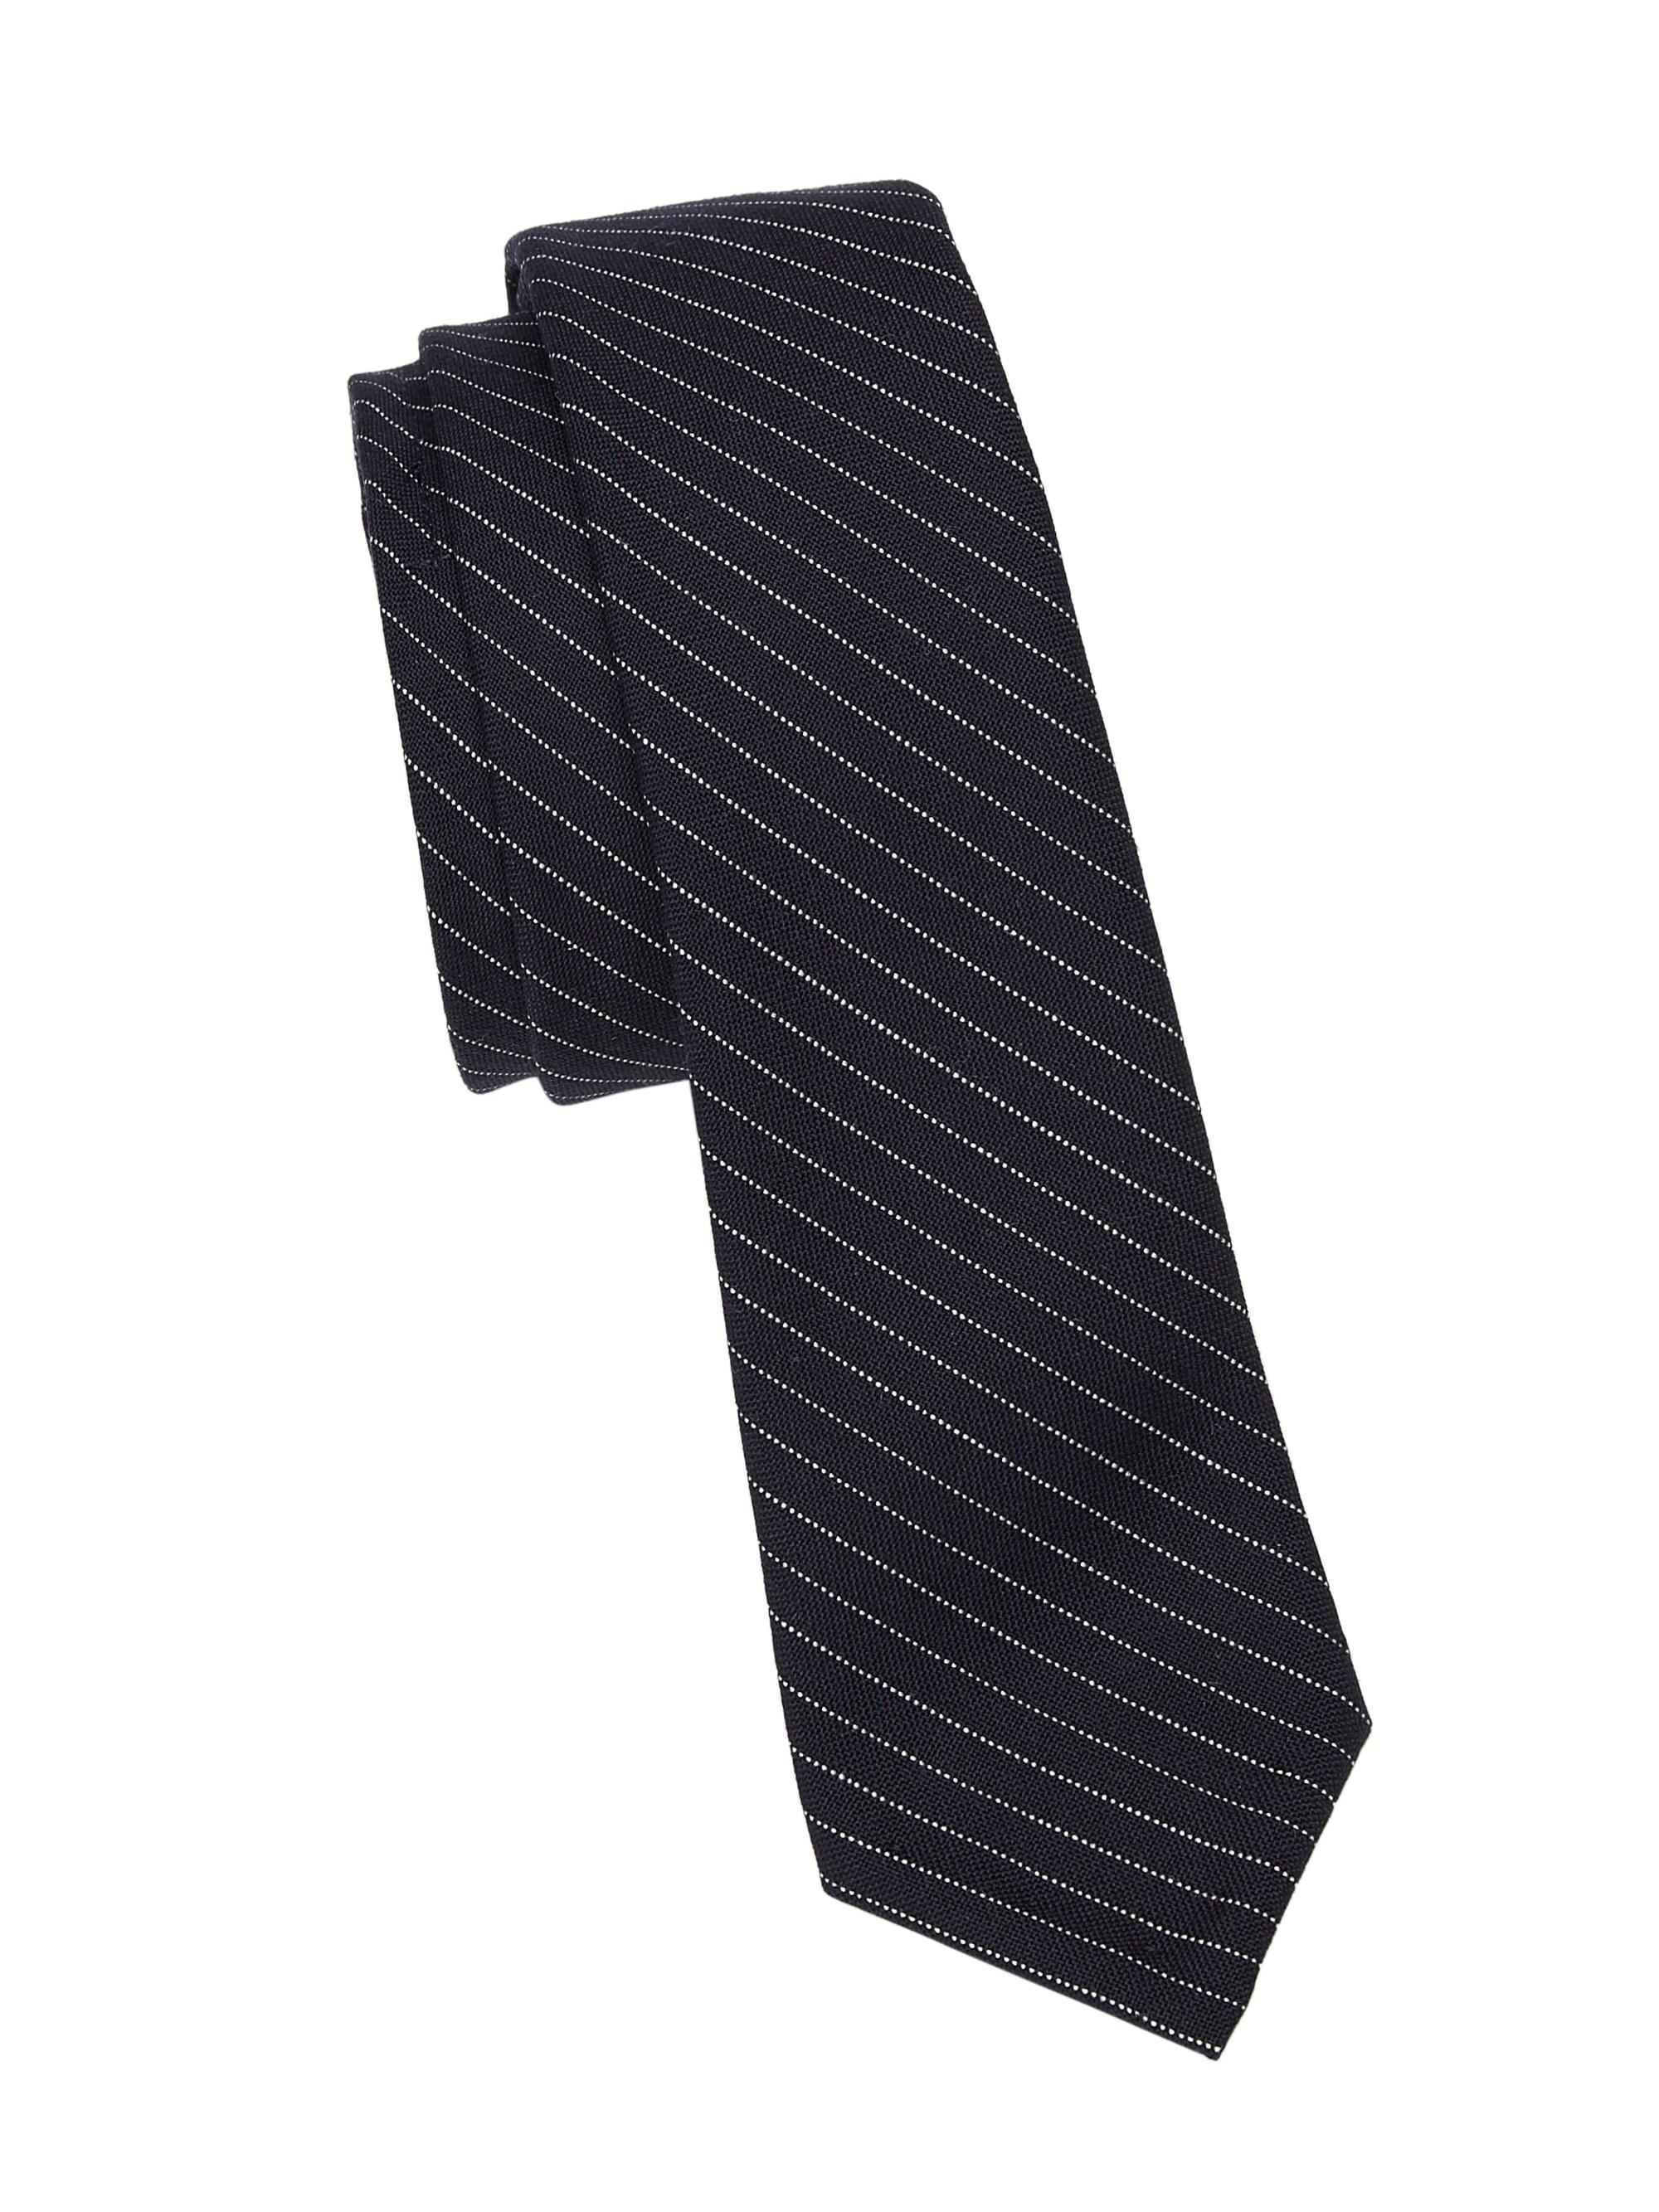 ff4bf2d9b539 Thom Browne Men s Classic Pinstripe Wool Tie - Navy in Blue for Men ...